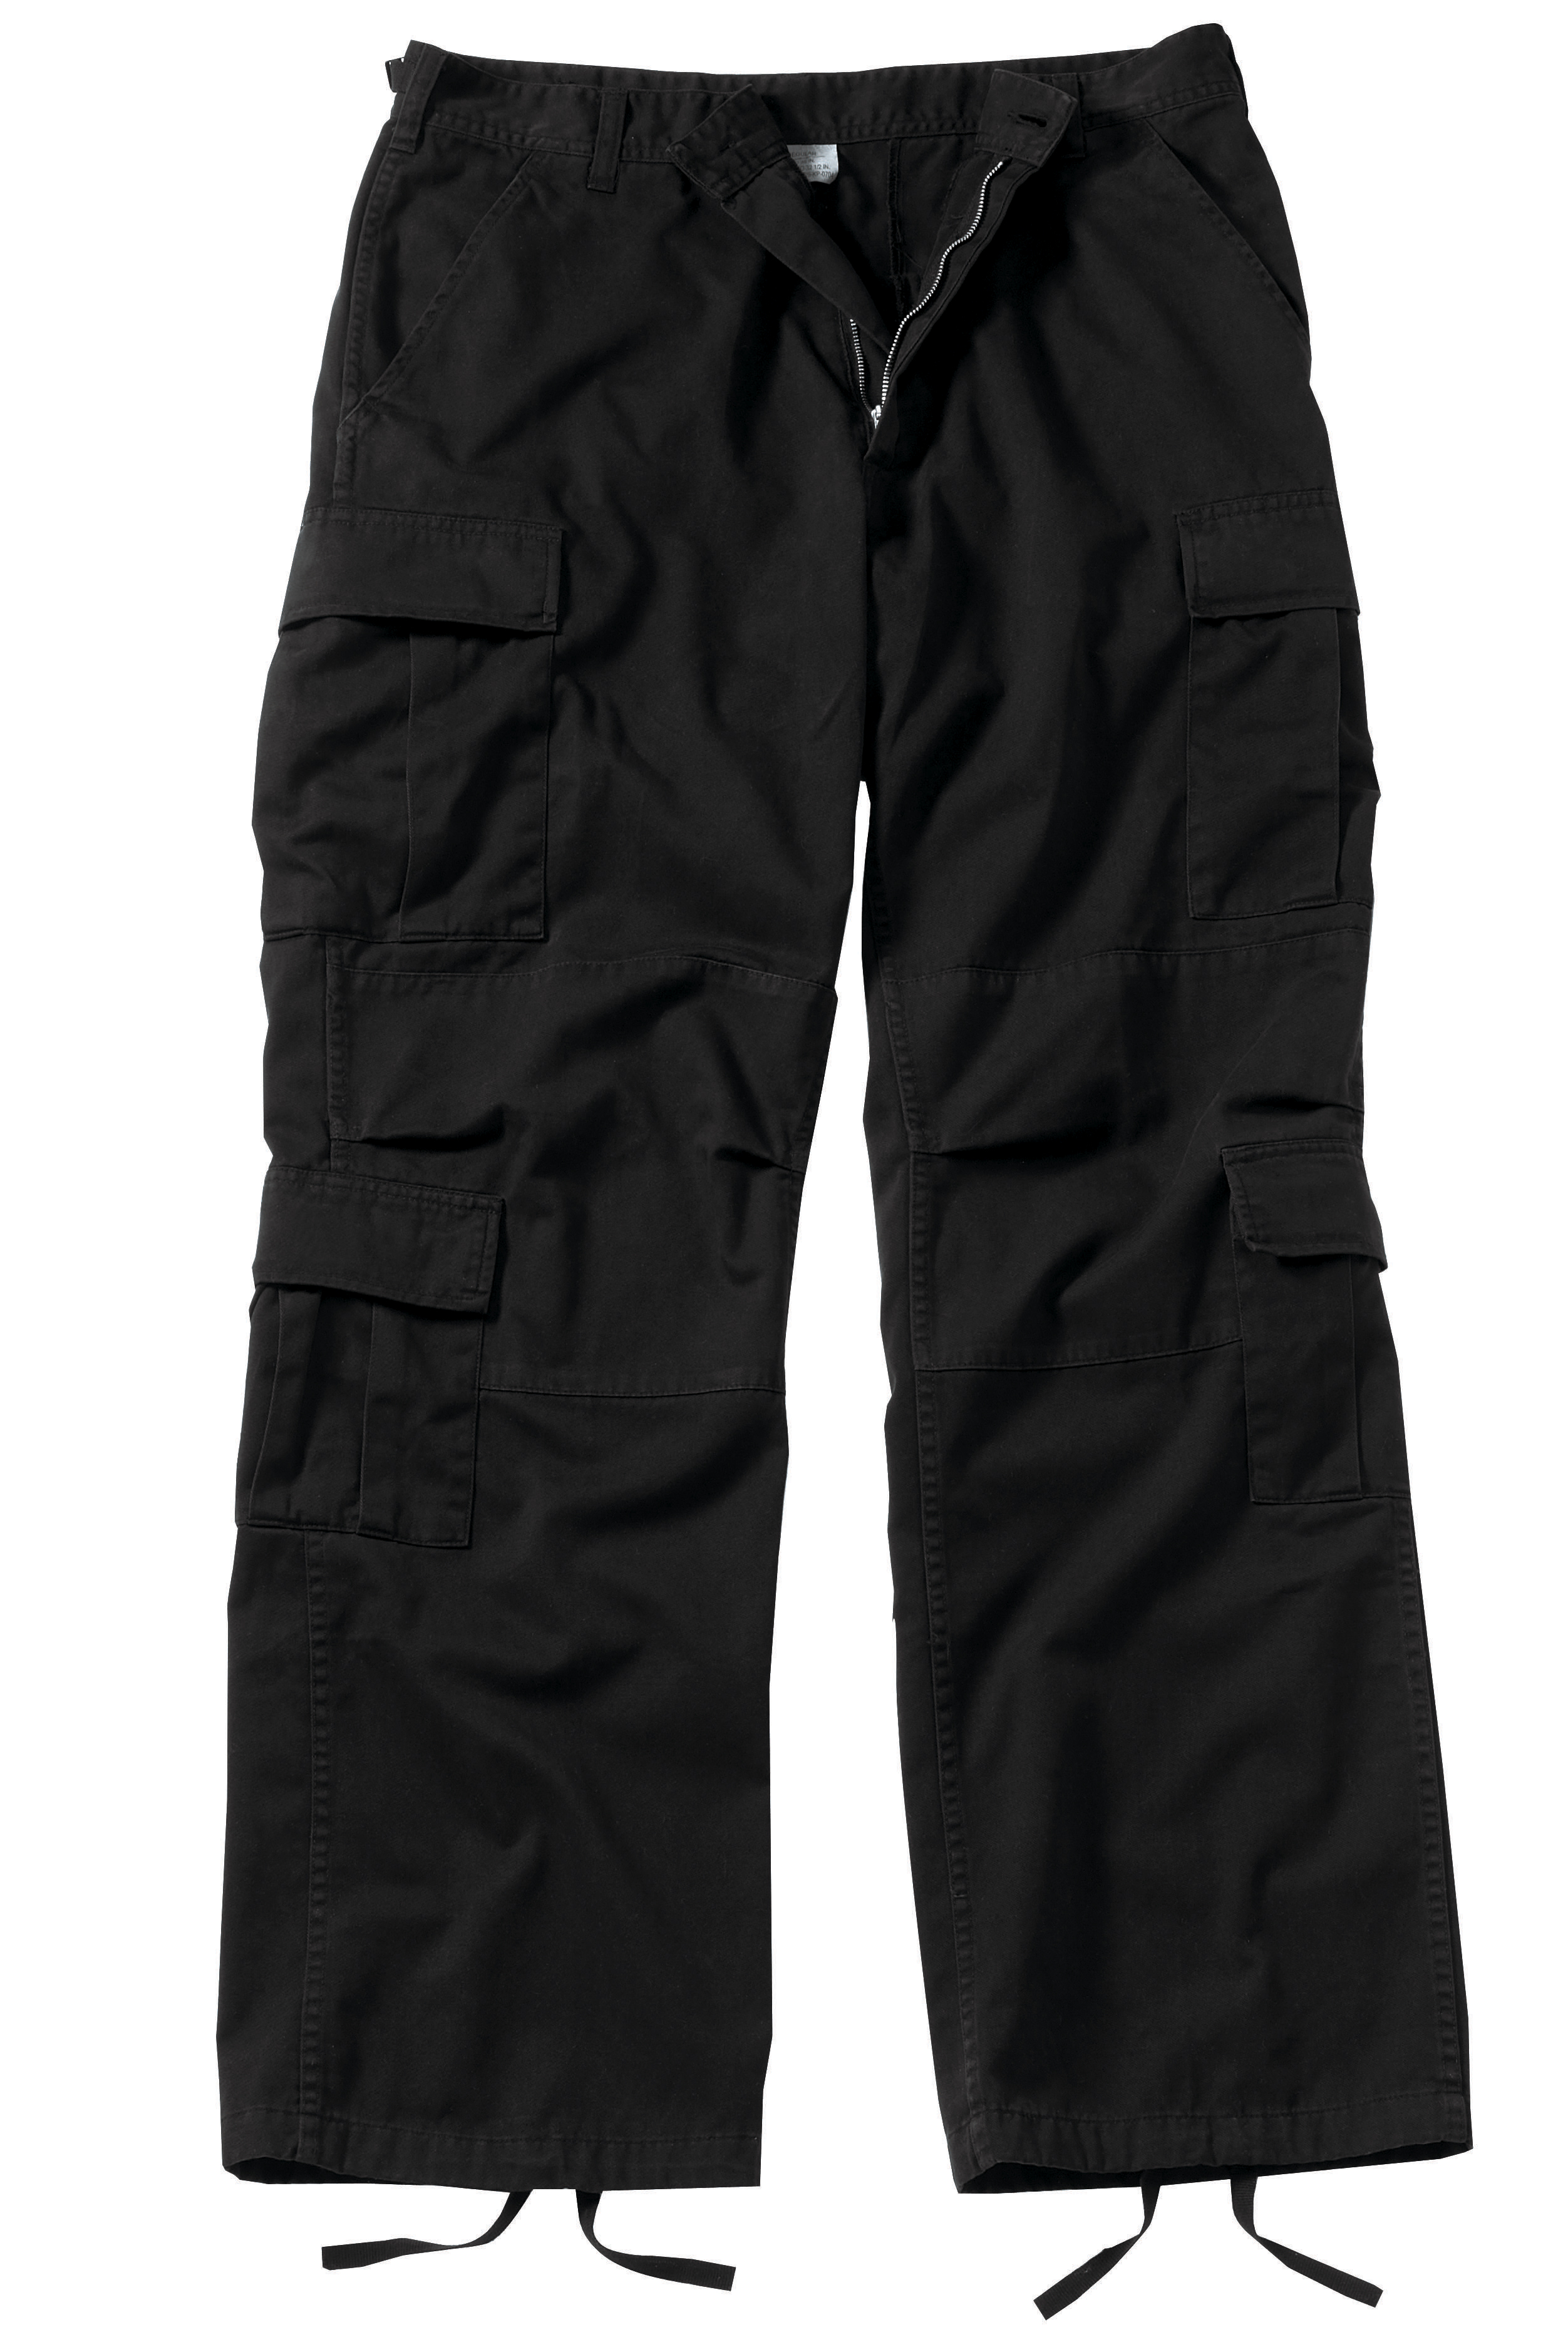 Rothco Paratrooper Fatigue Pants